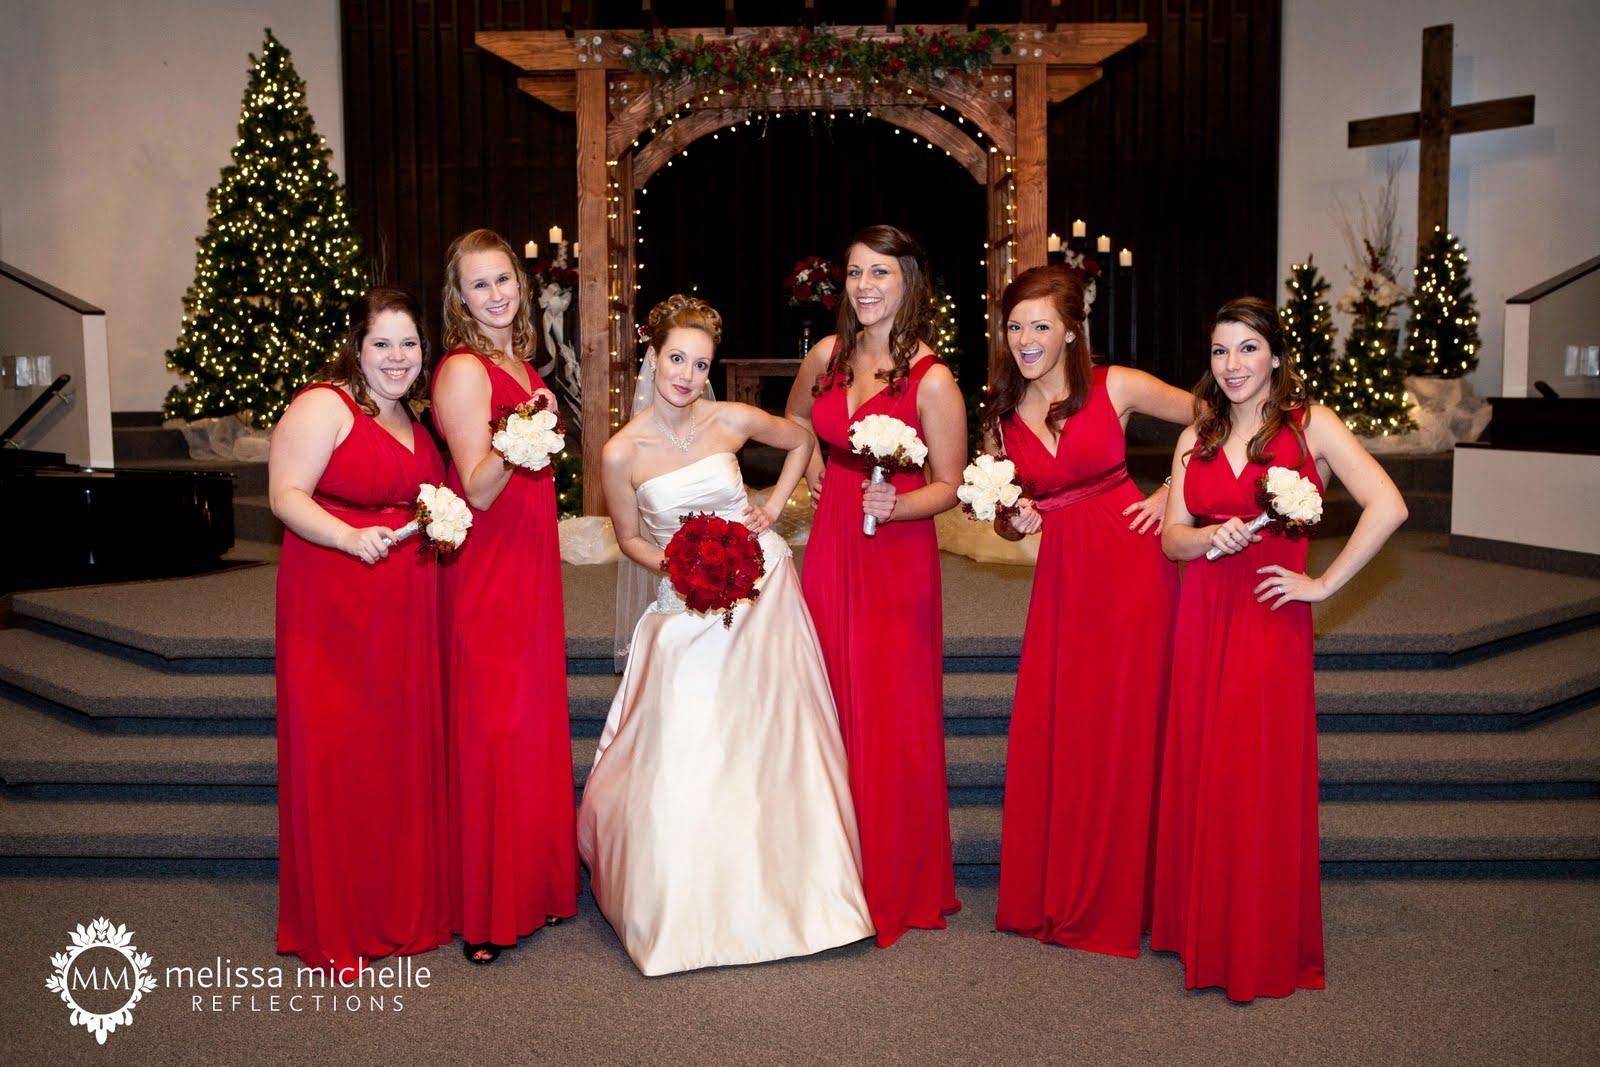 melissa michelle reflections eric amp denises wedding